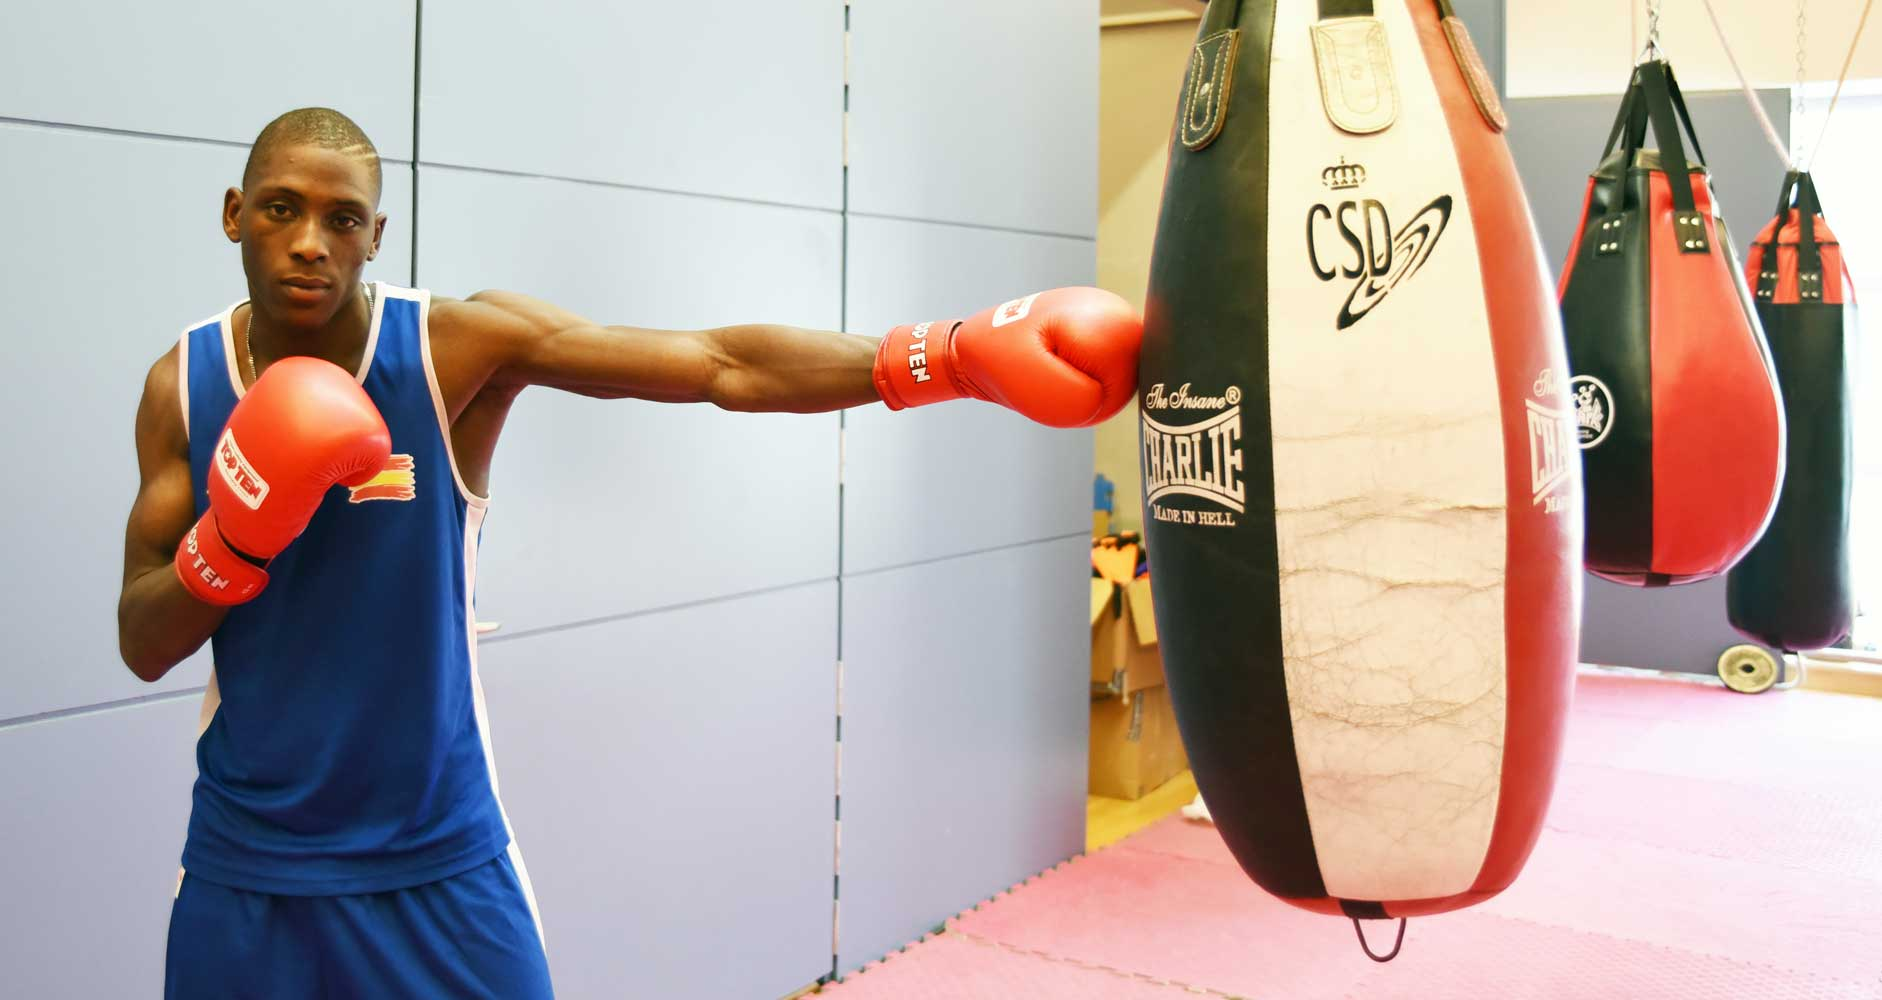 Sissokho posa para el CSD. Foto: CSD